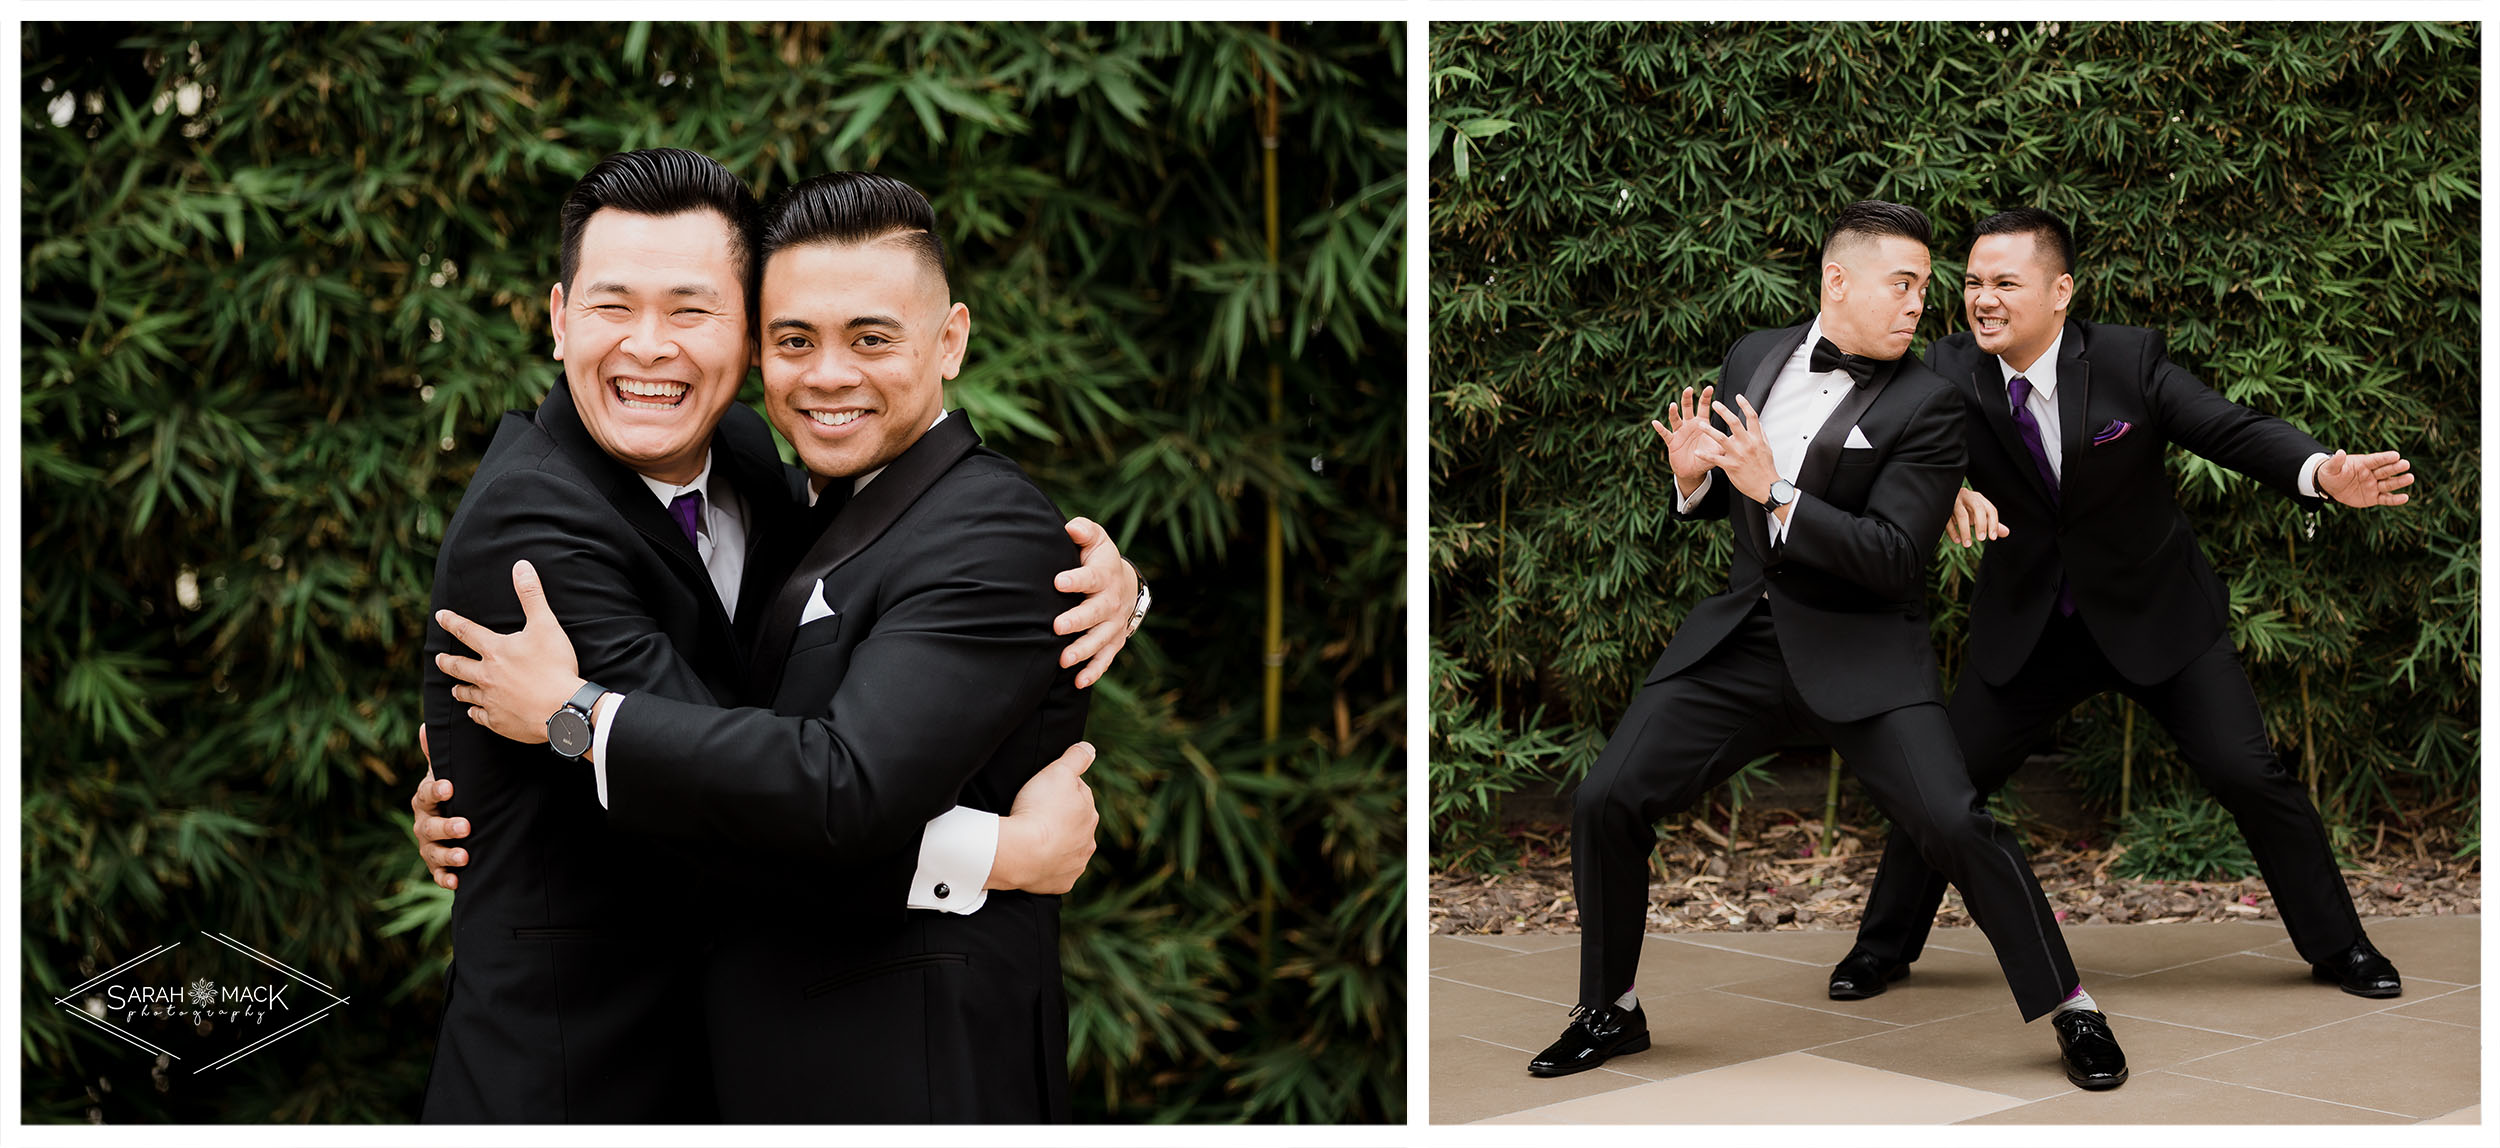 SR_Saint-Andrews-Pasadena-Wedding-Photography-16.jpg